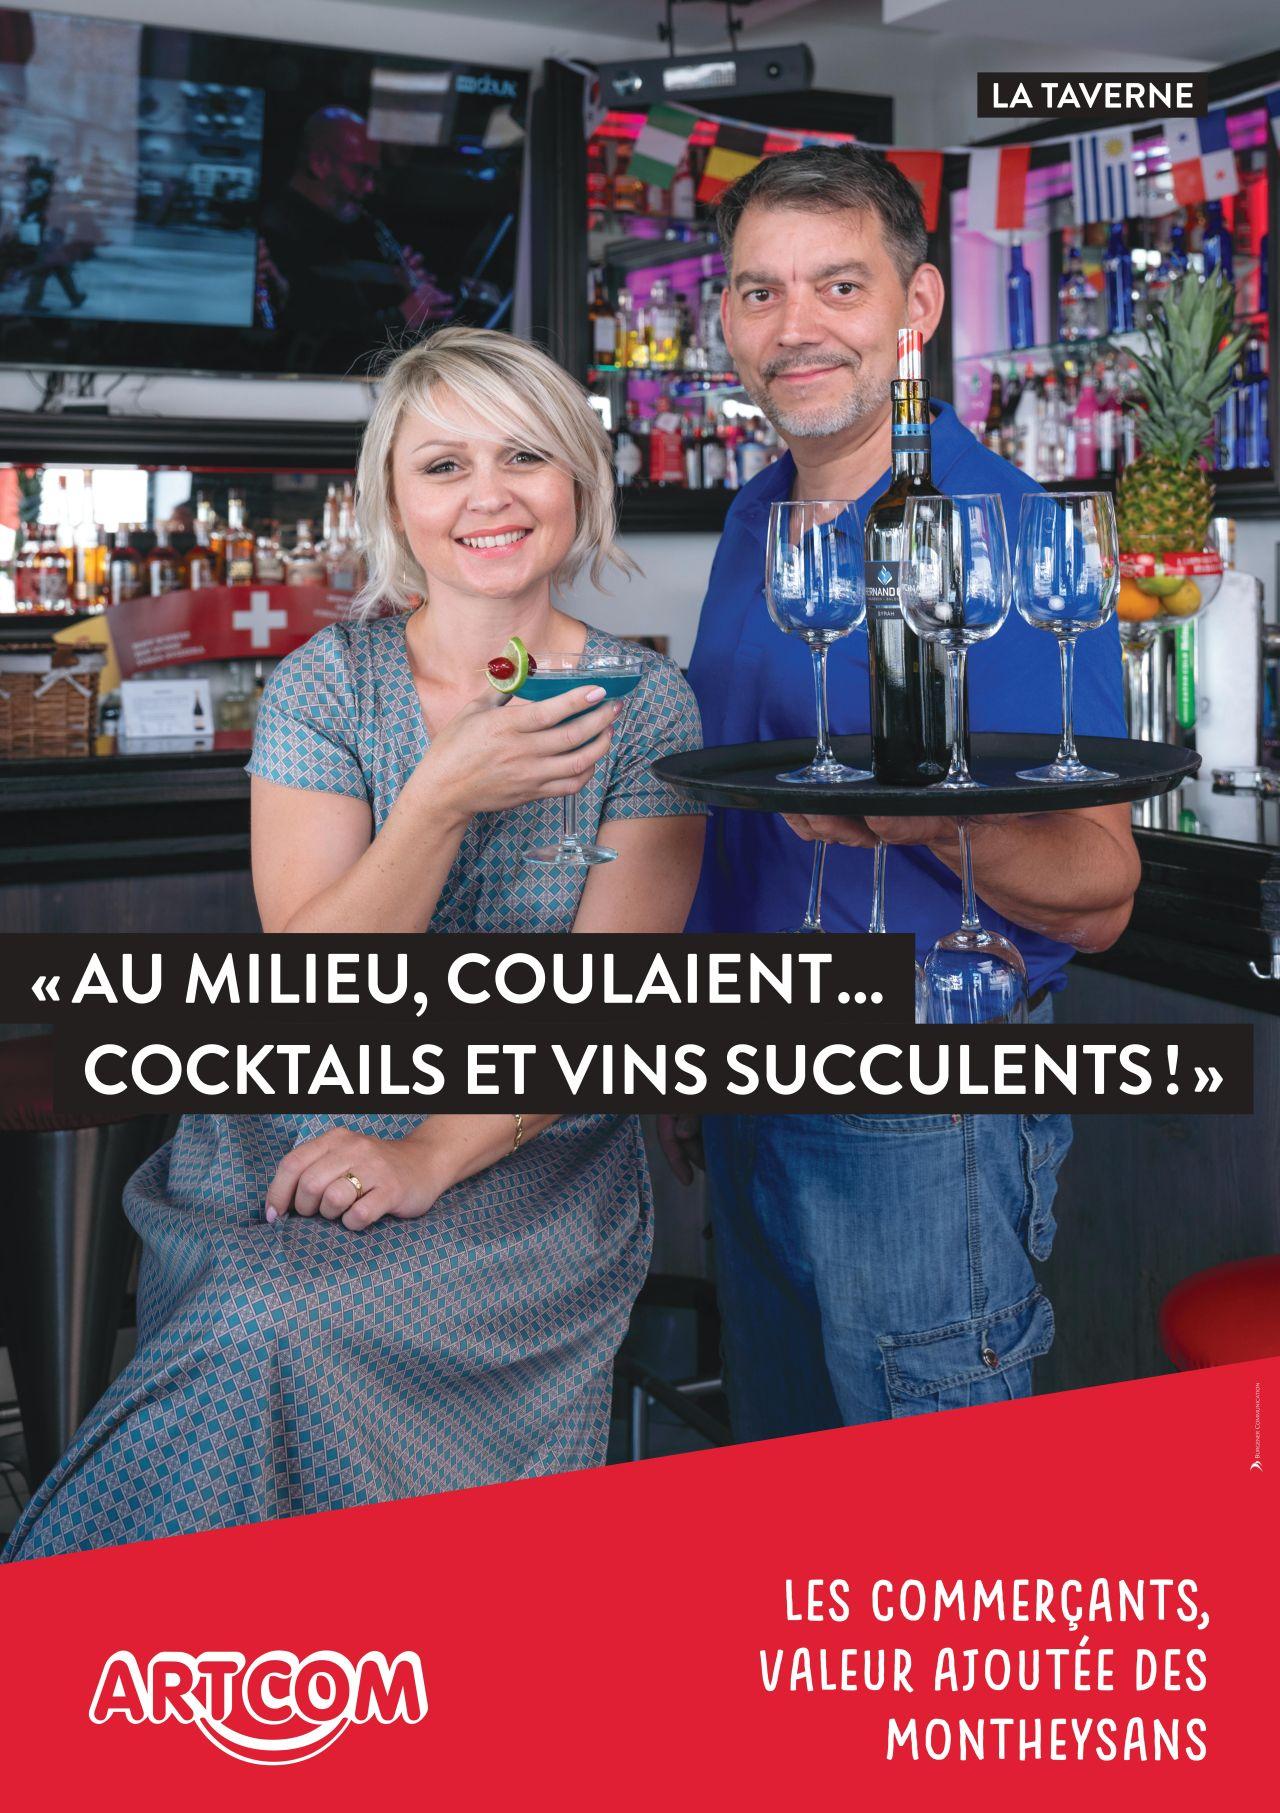 Affiche La Taverne